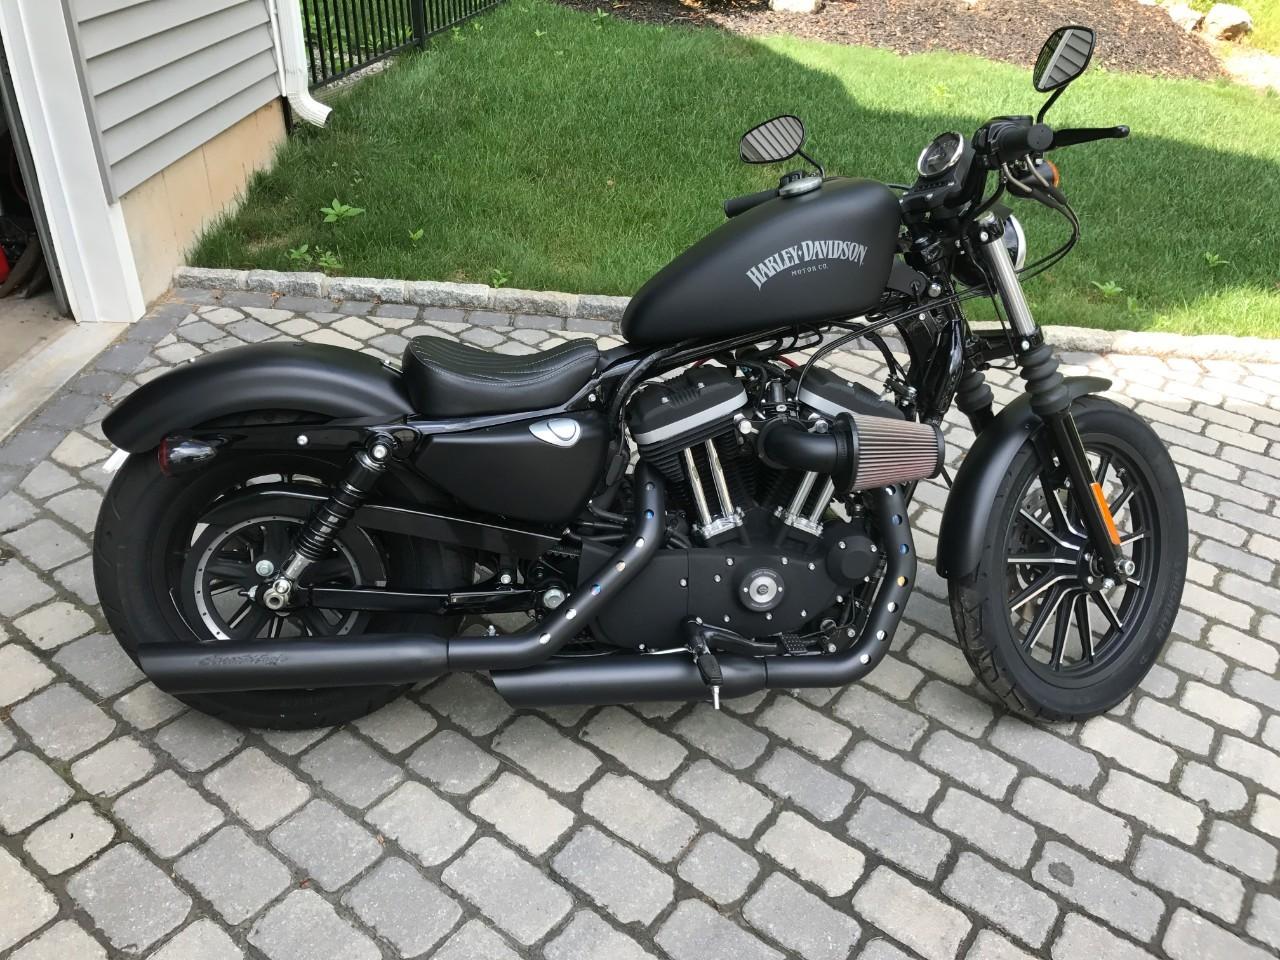 XL883 Sportster - 2 Tone Purple For Sale - Harley-Davidson